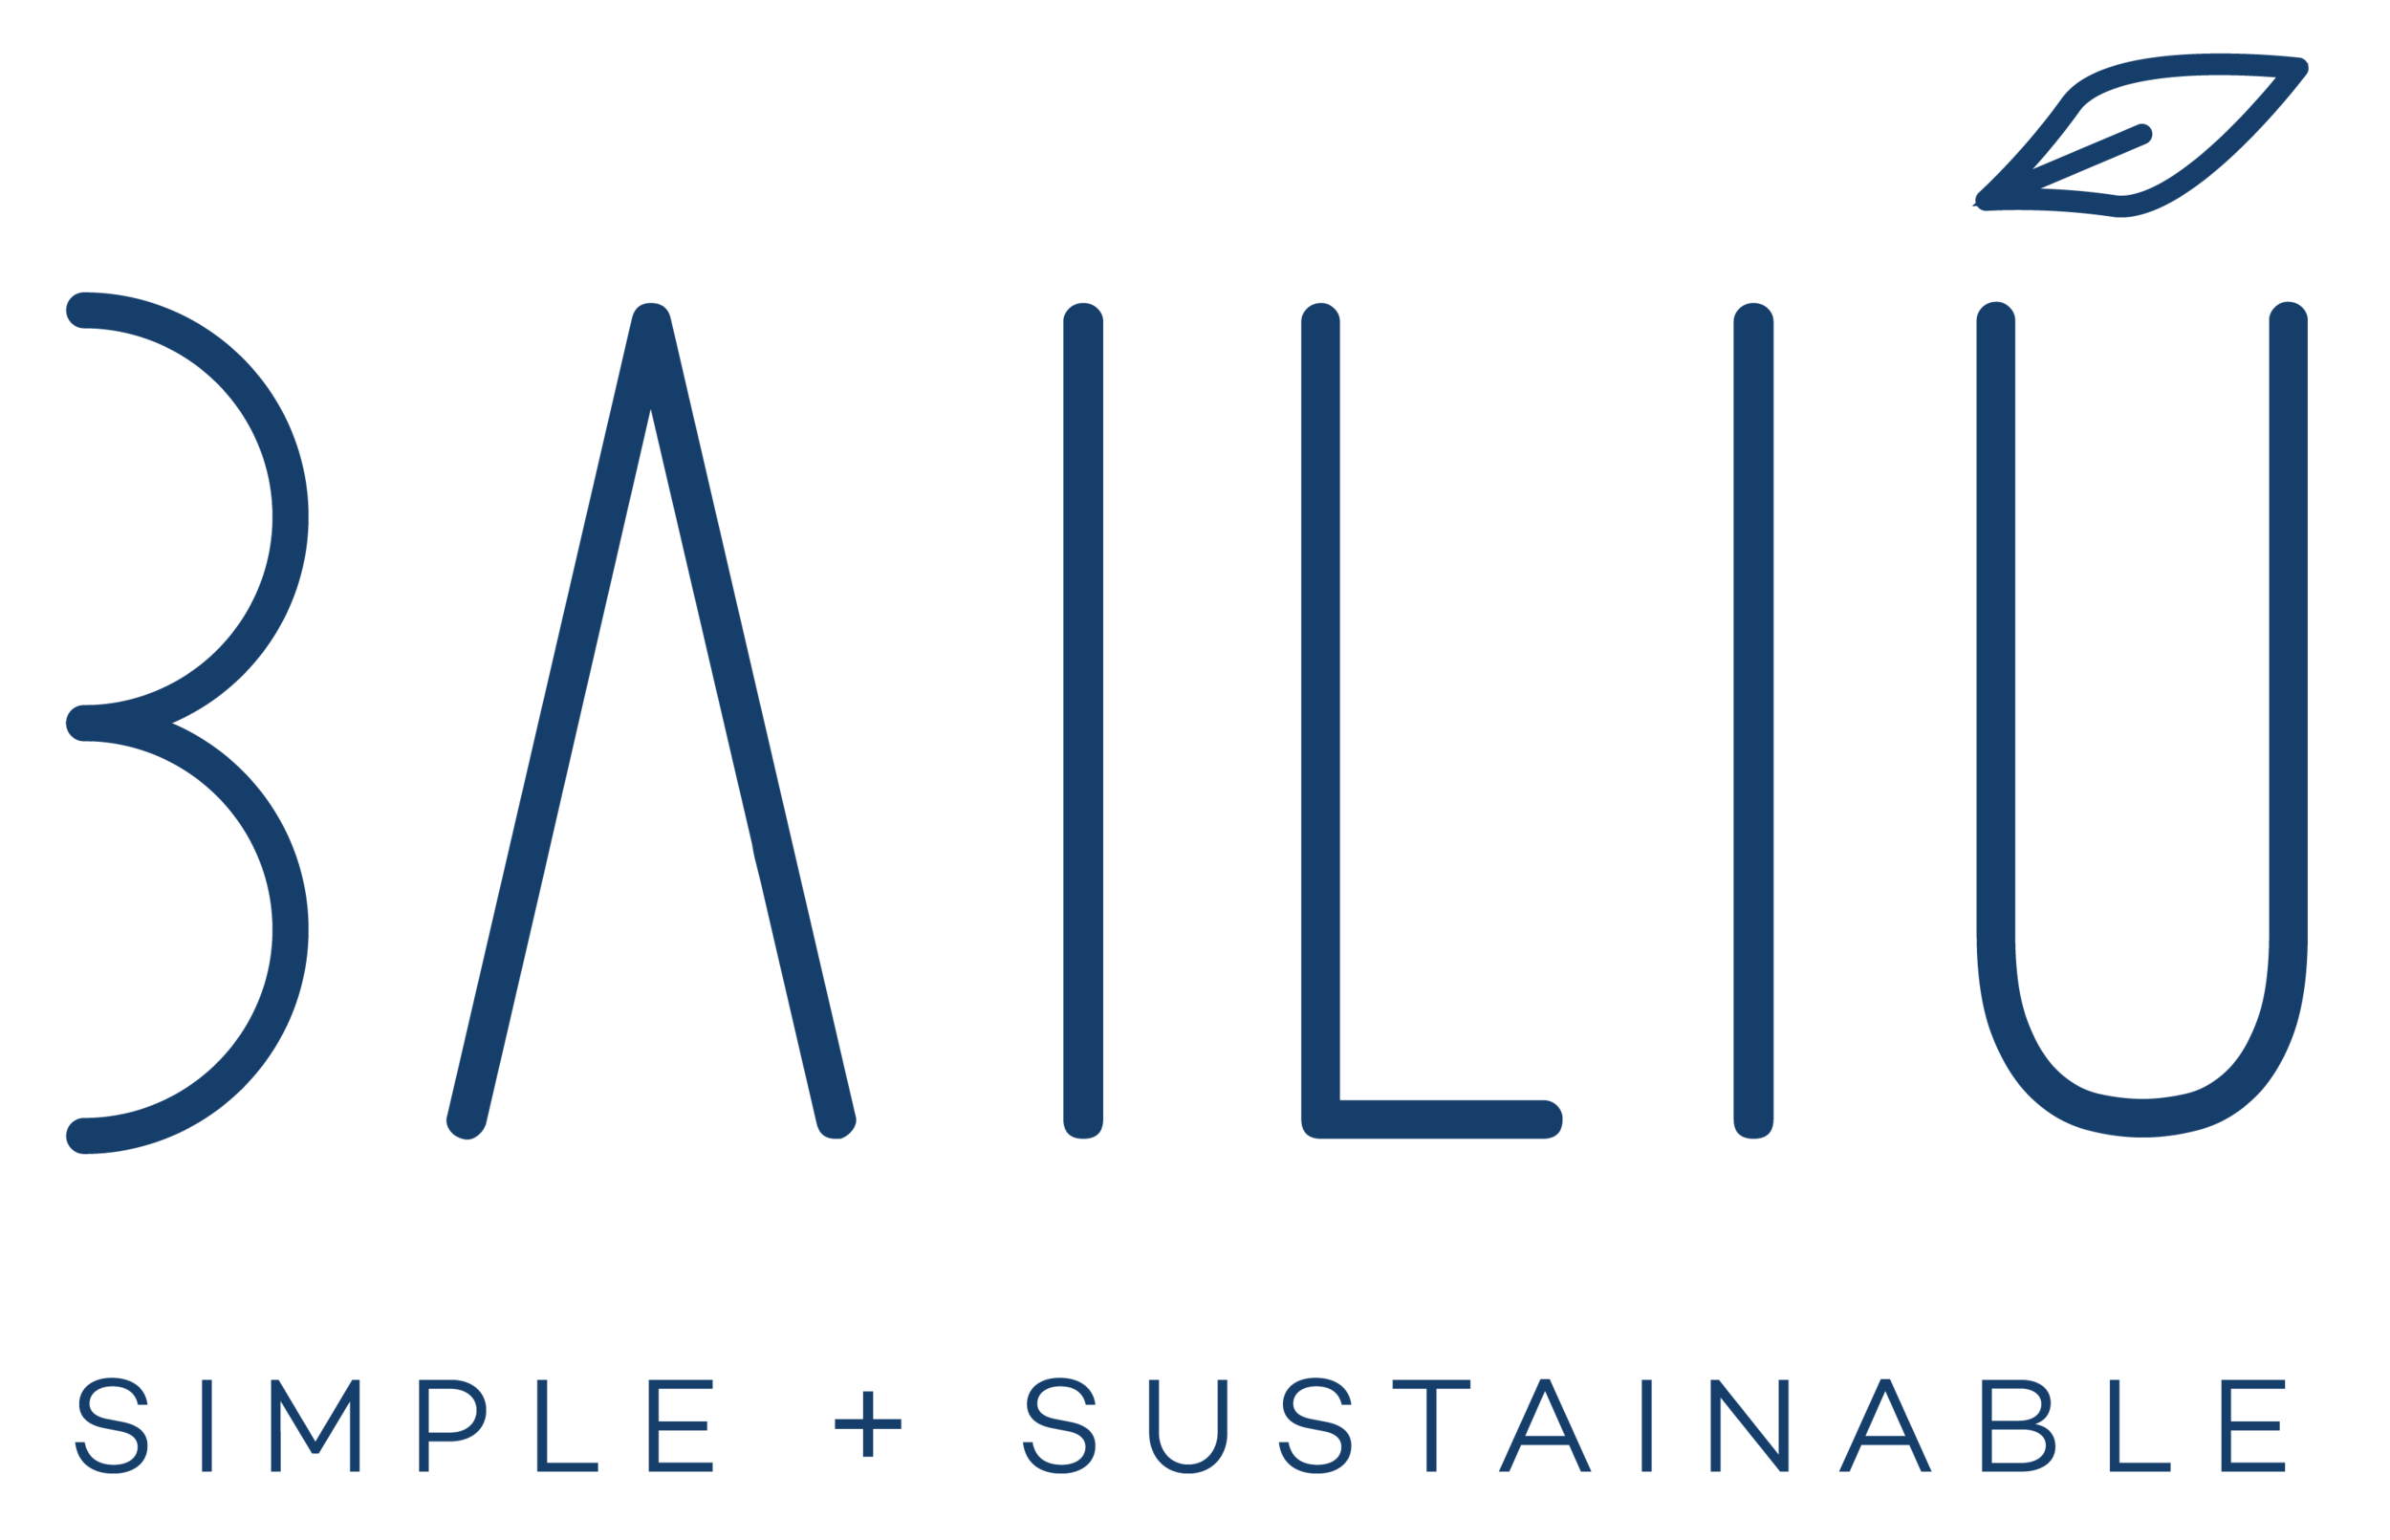 Bailiu_main-logo-tag.png